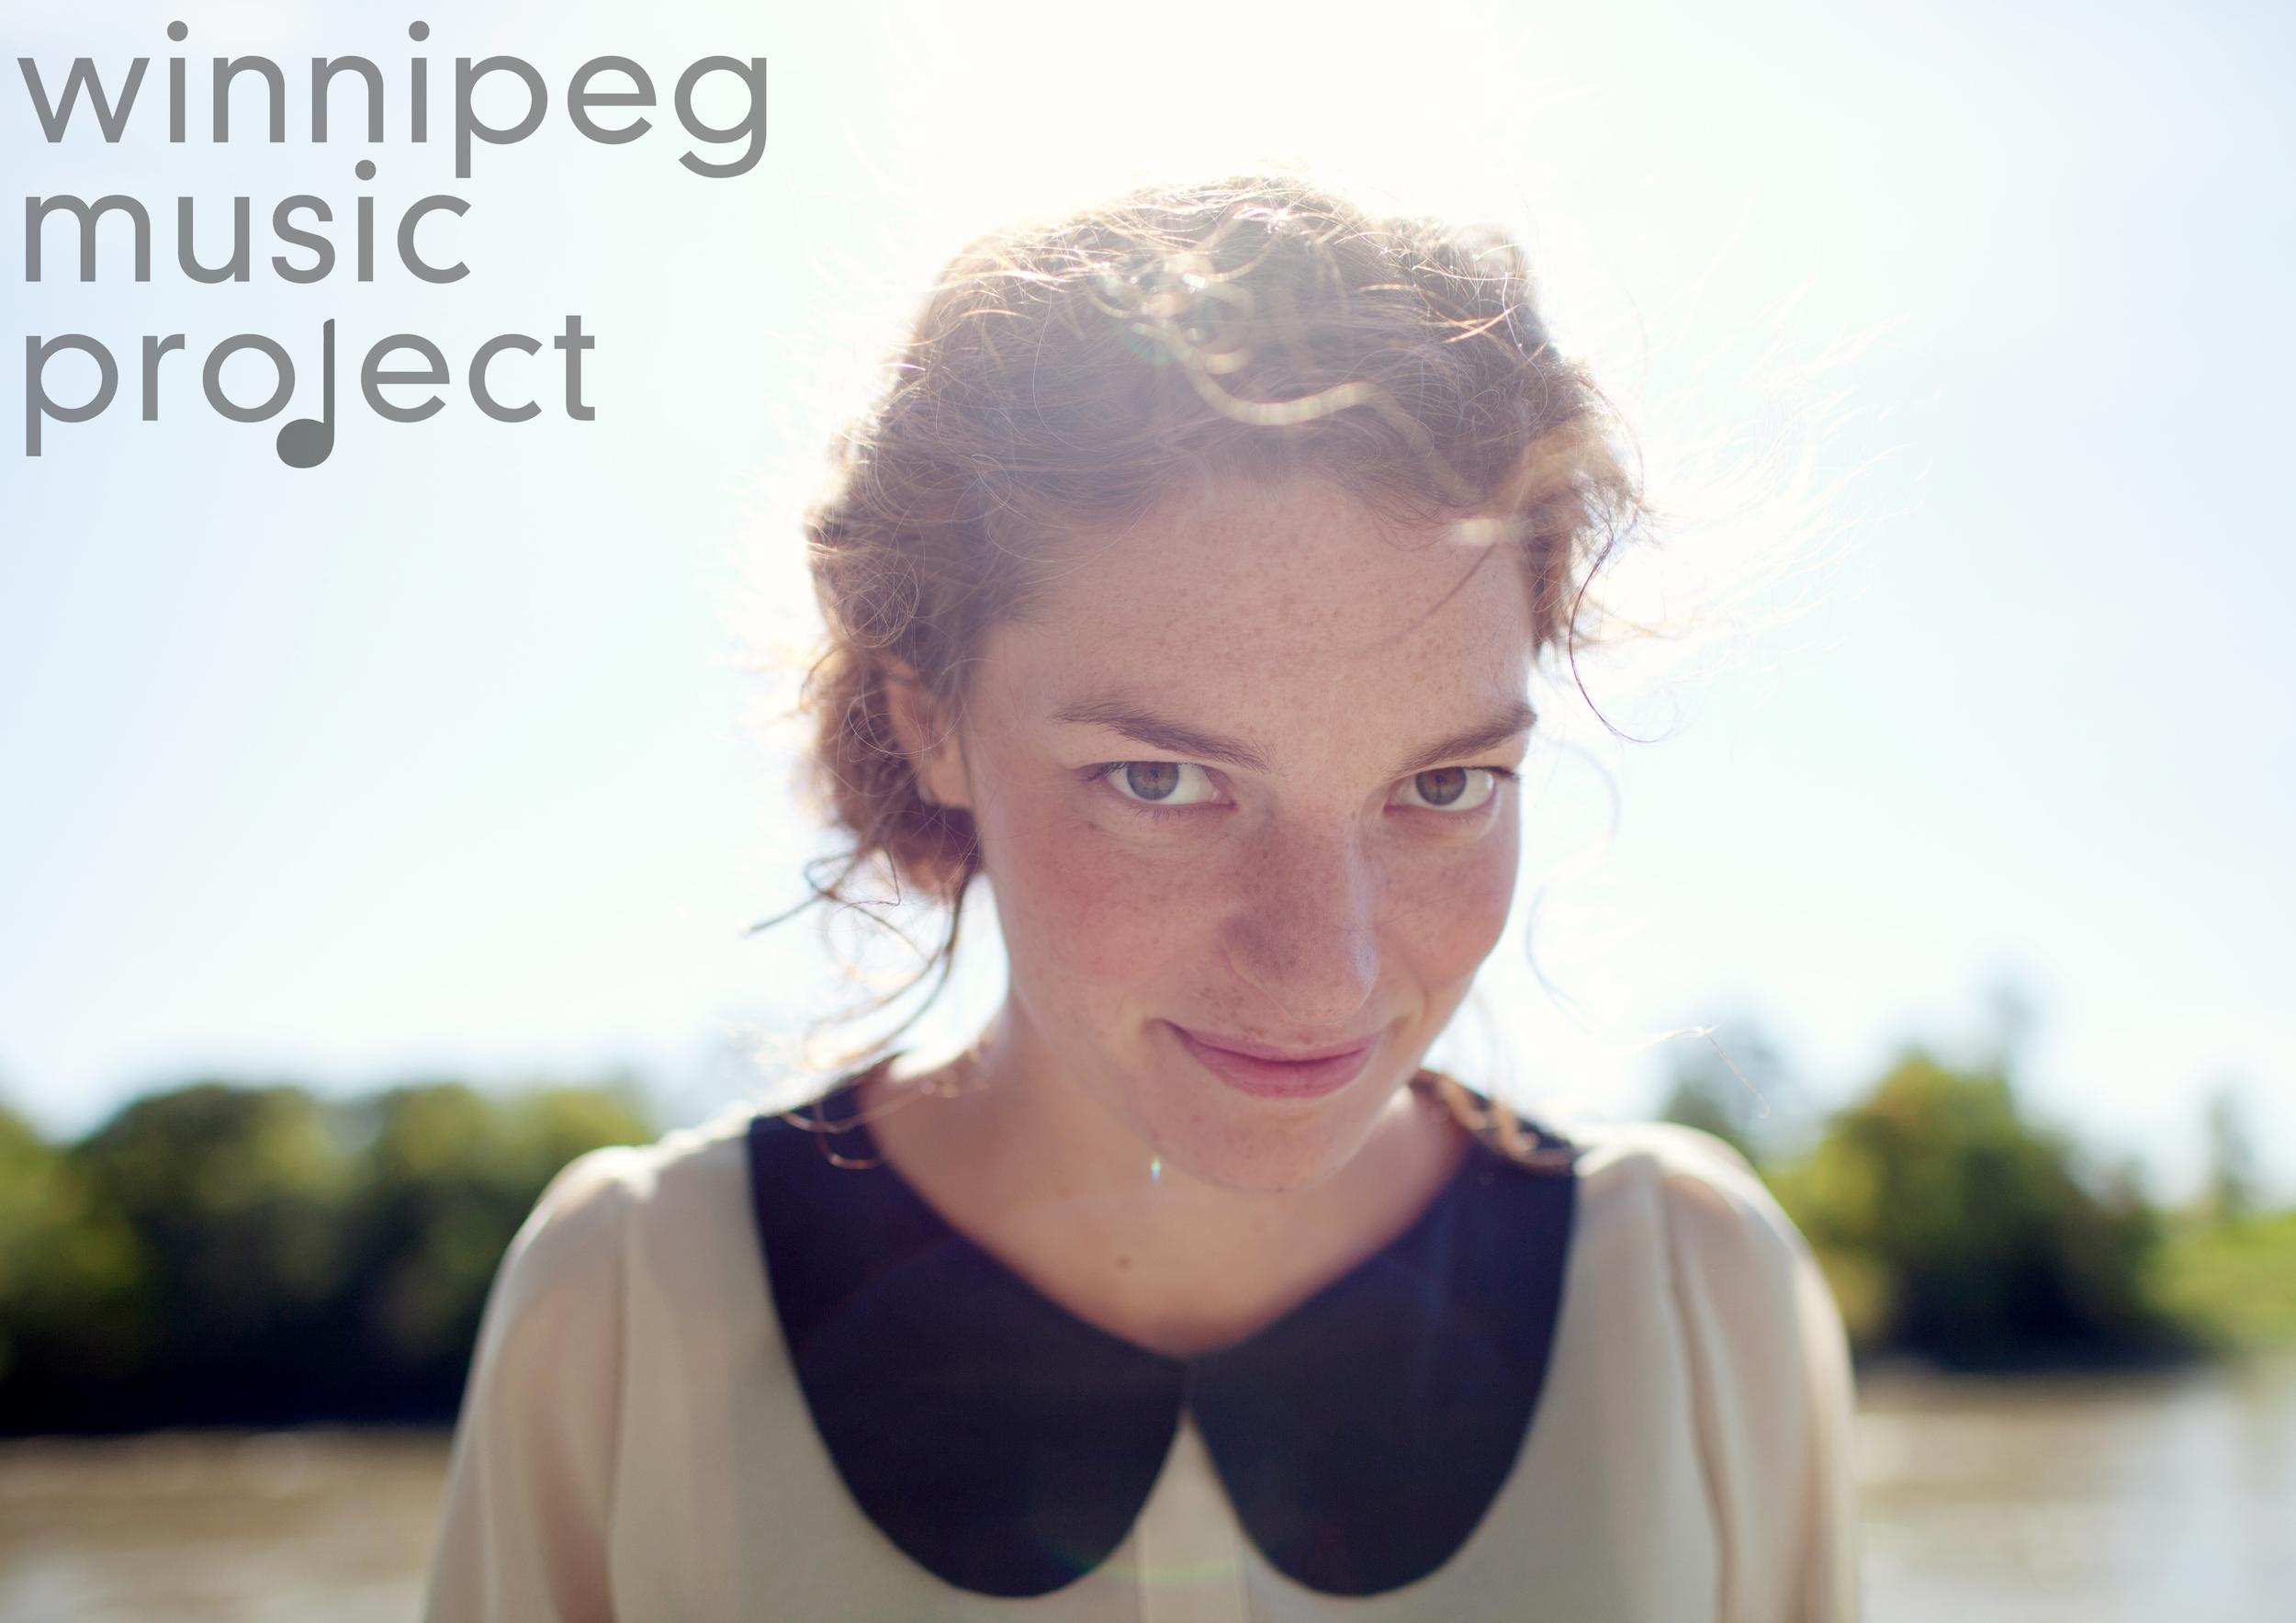 www.ashleybieniarz.com - Pianist | Singer-Songwriter | Winnipeg Music Blogger Erin Propp